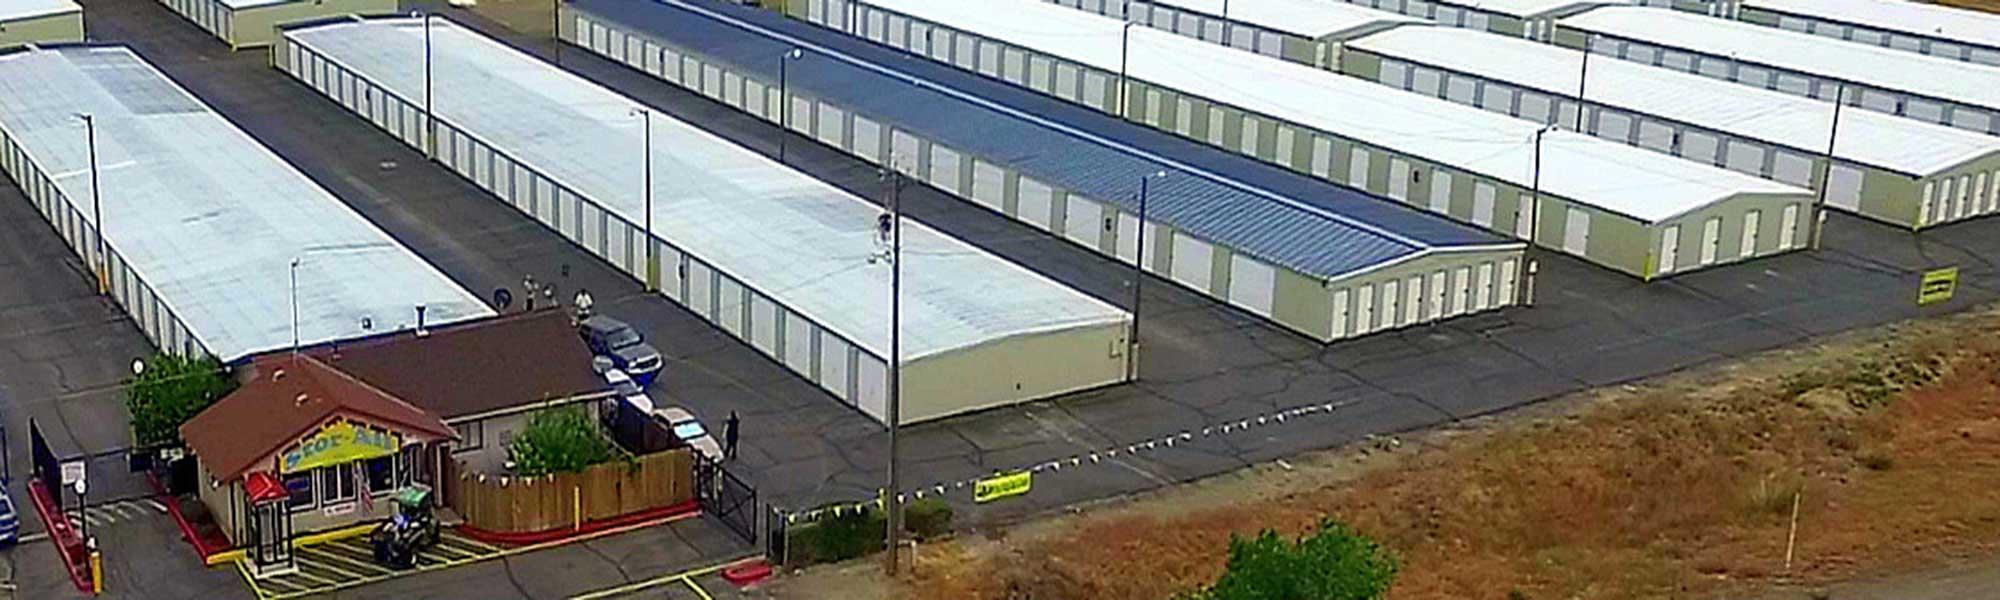 Self storage in Winnemucca NV